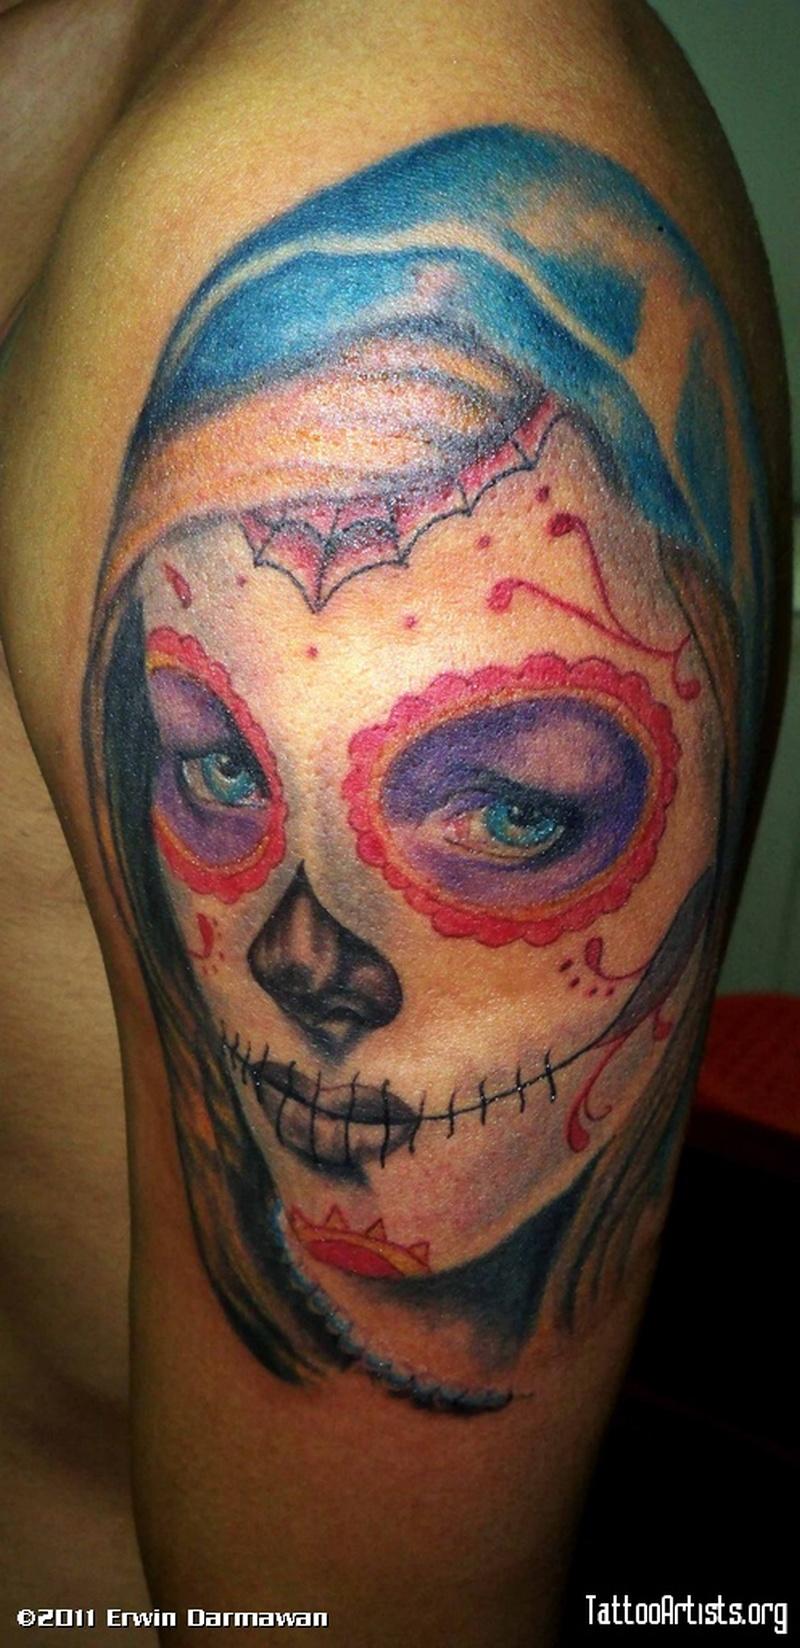 sugar skull face tattoo on shoulder tattoos book tattoos designs. Black Bedroom Furniture Sets. Home Design Ideas